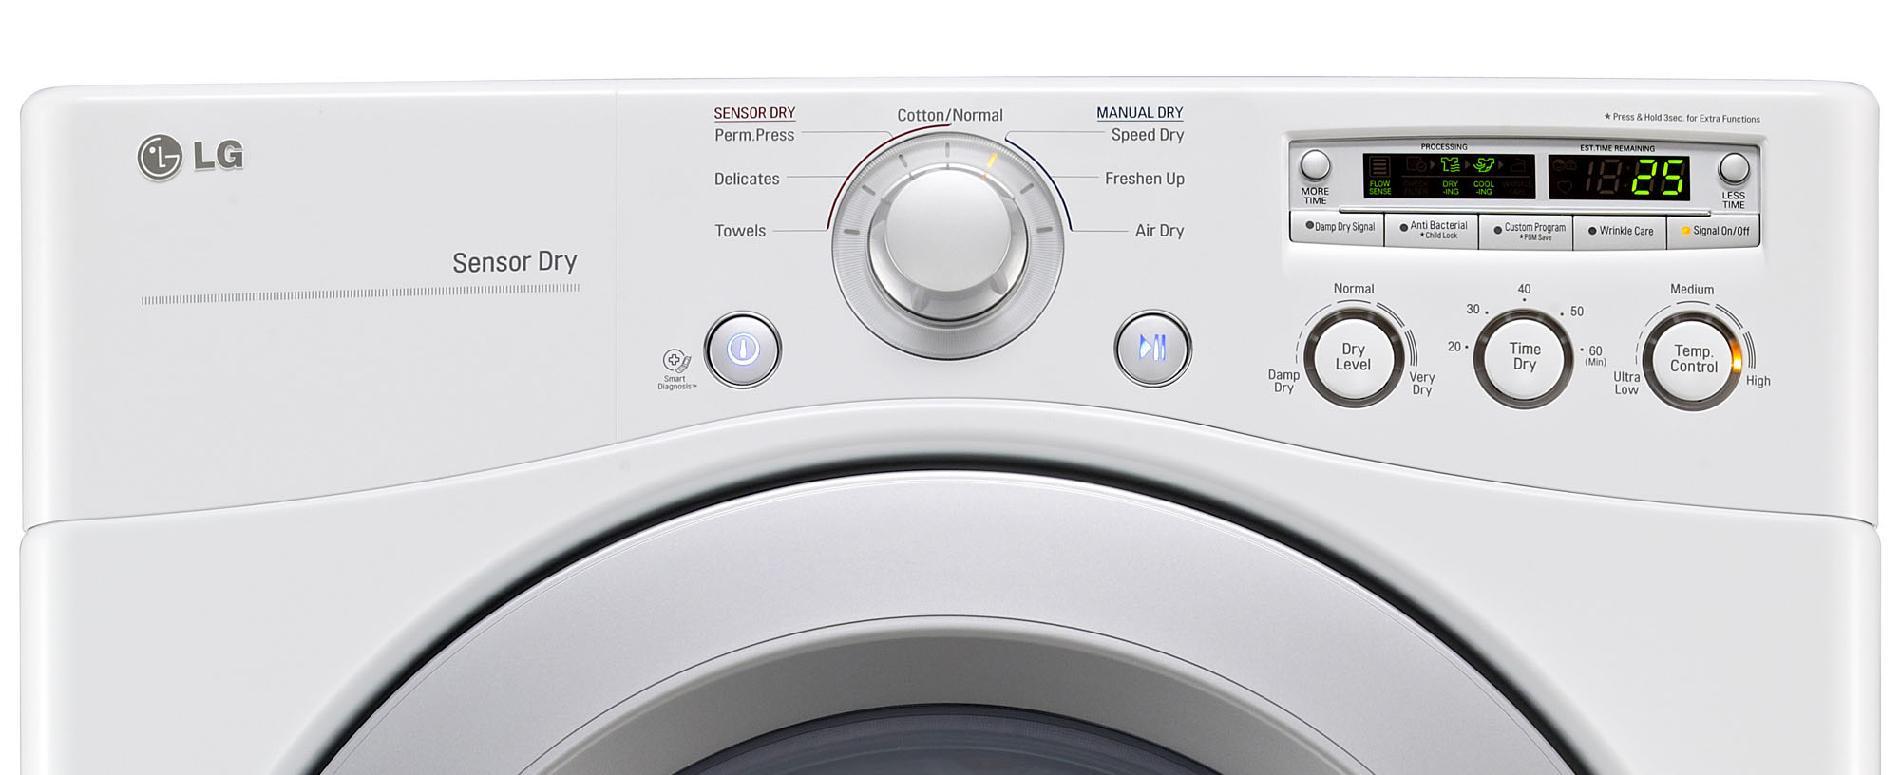 LG 7.3 cu. ft. Gas Dryer w/ Sensor Dry - White